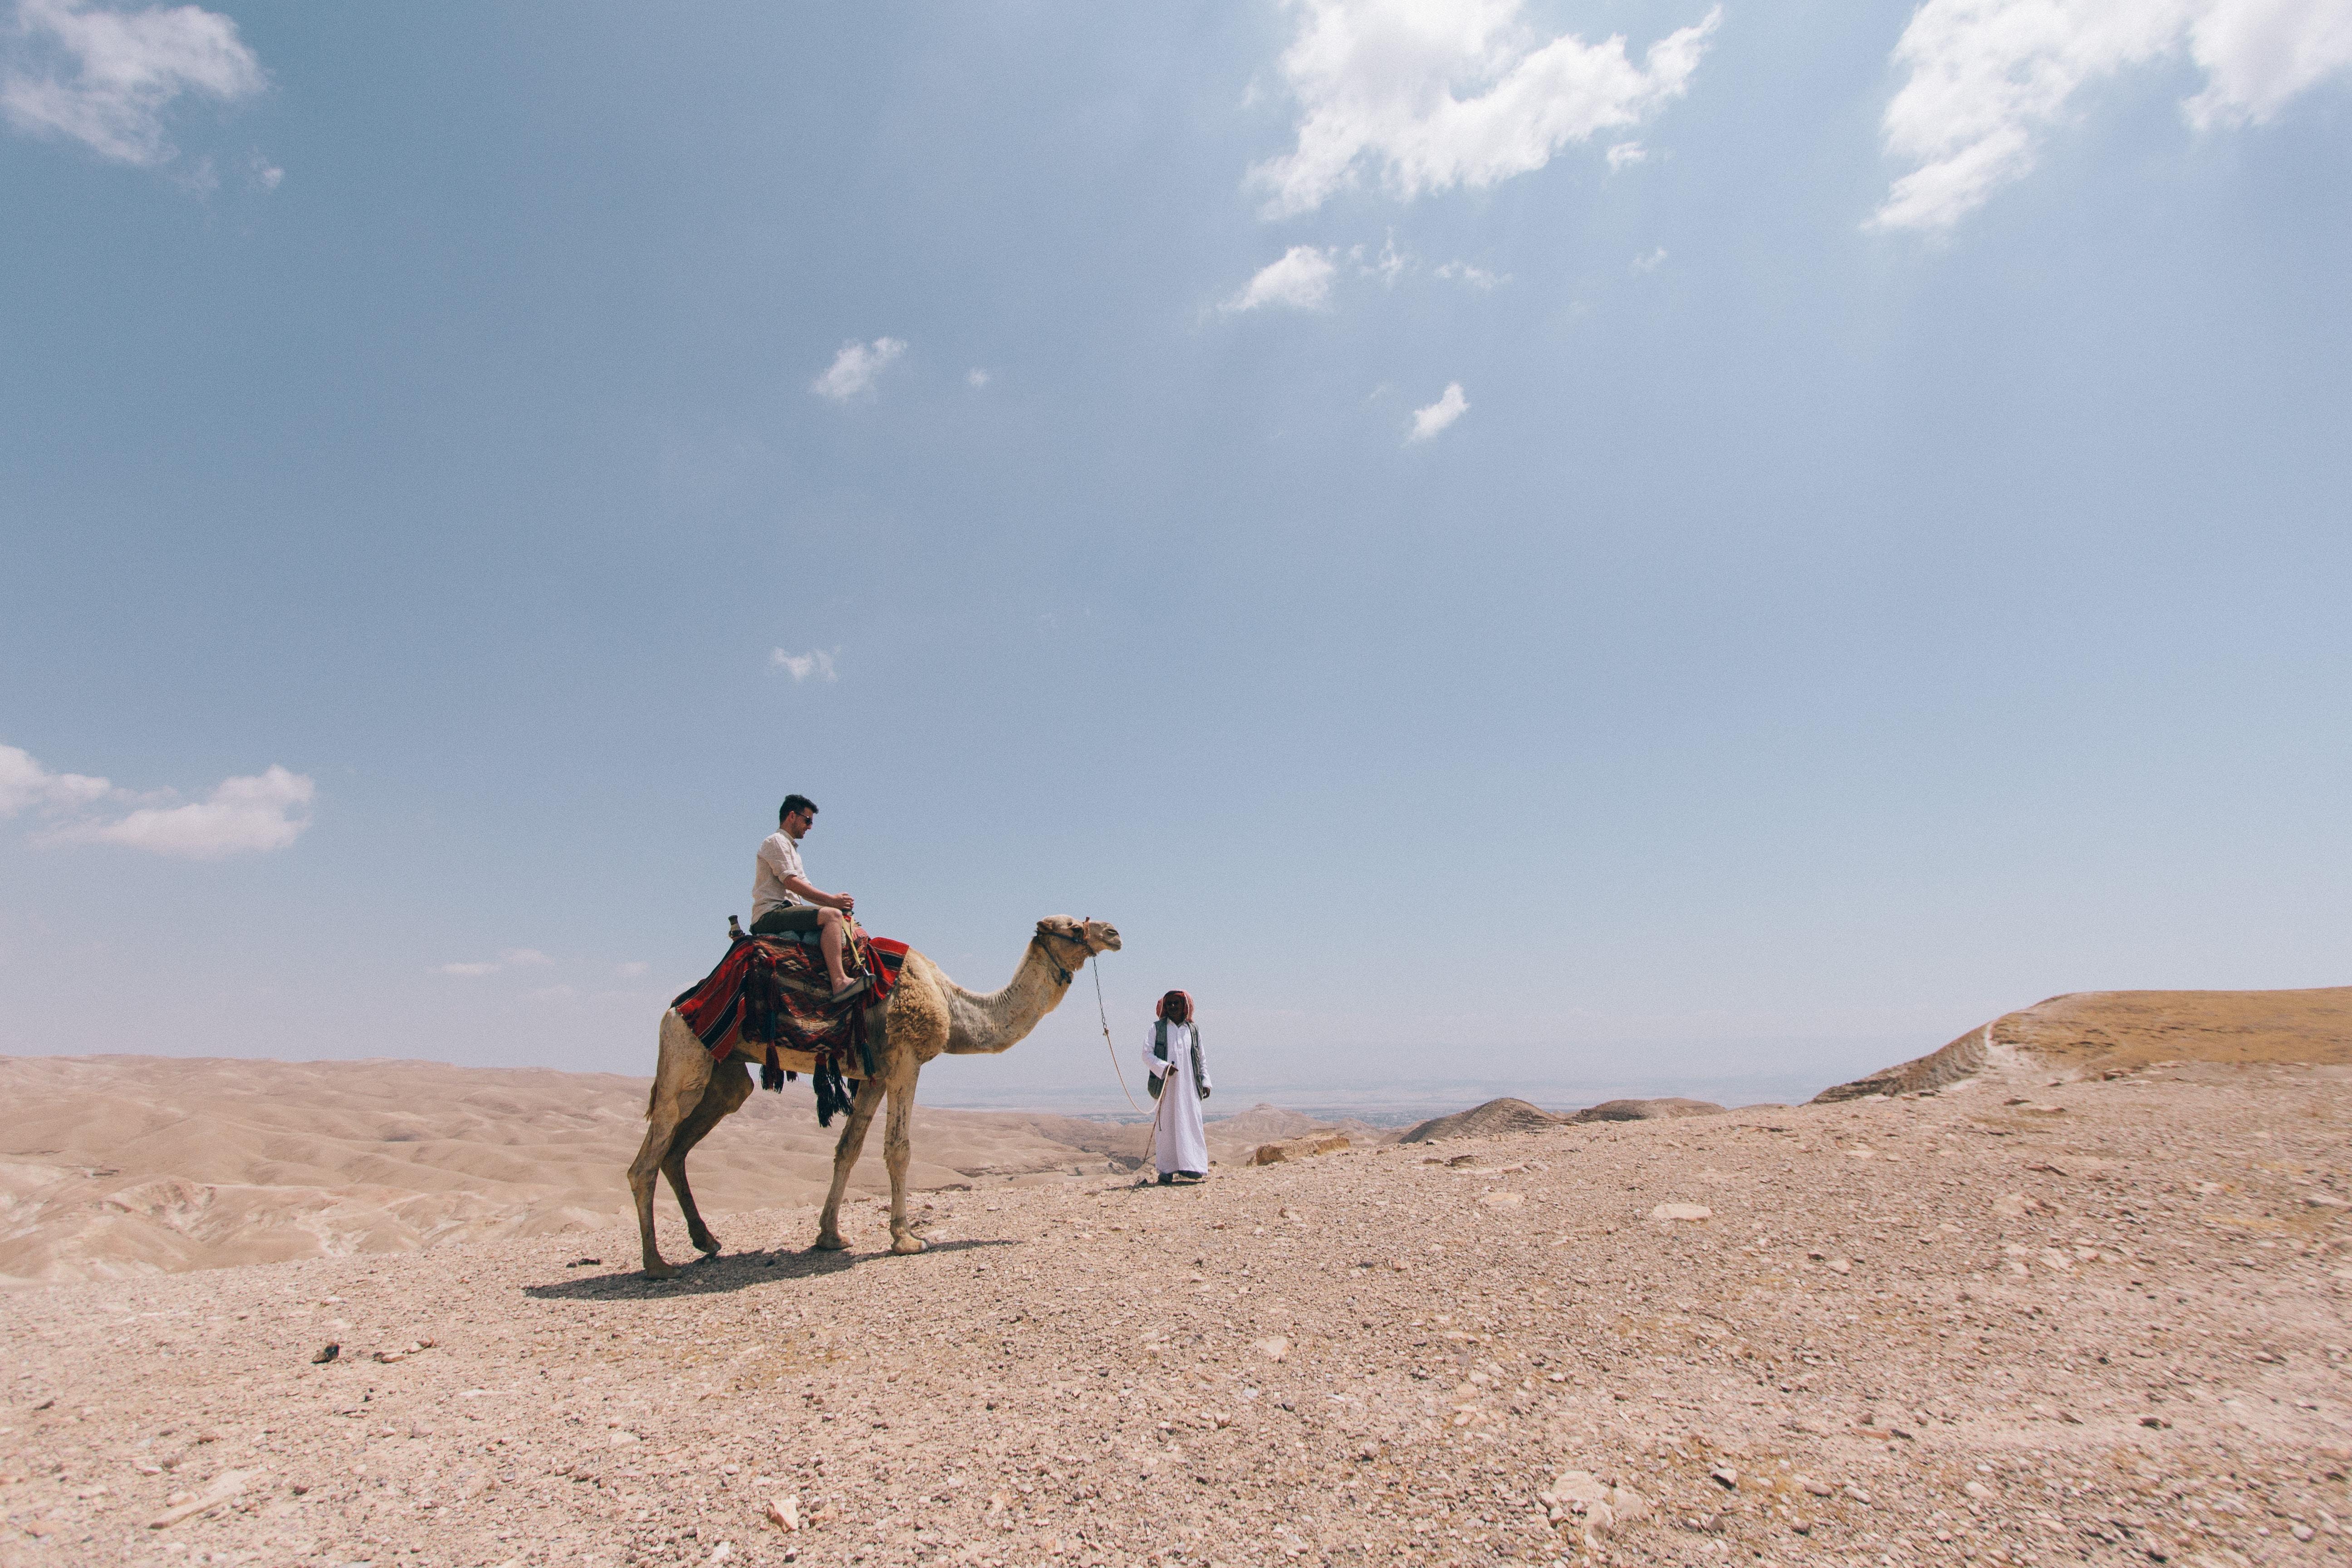 People ride a camel through the dry desert sand of Kfar Adumim